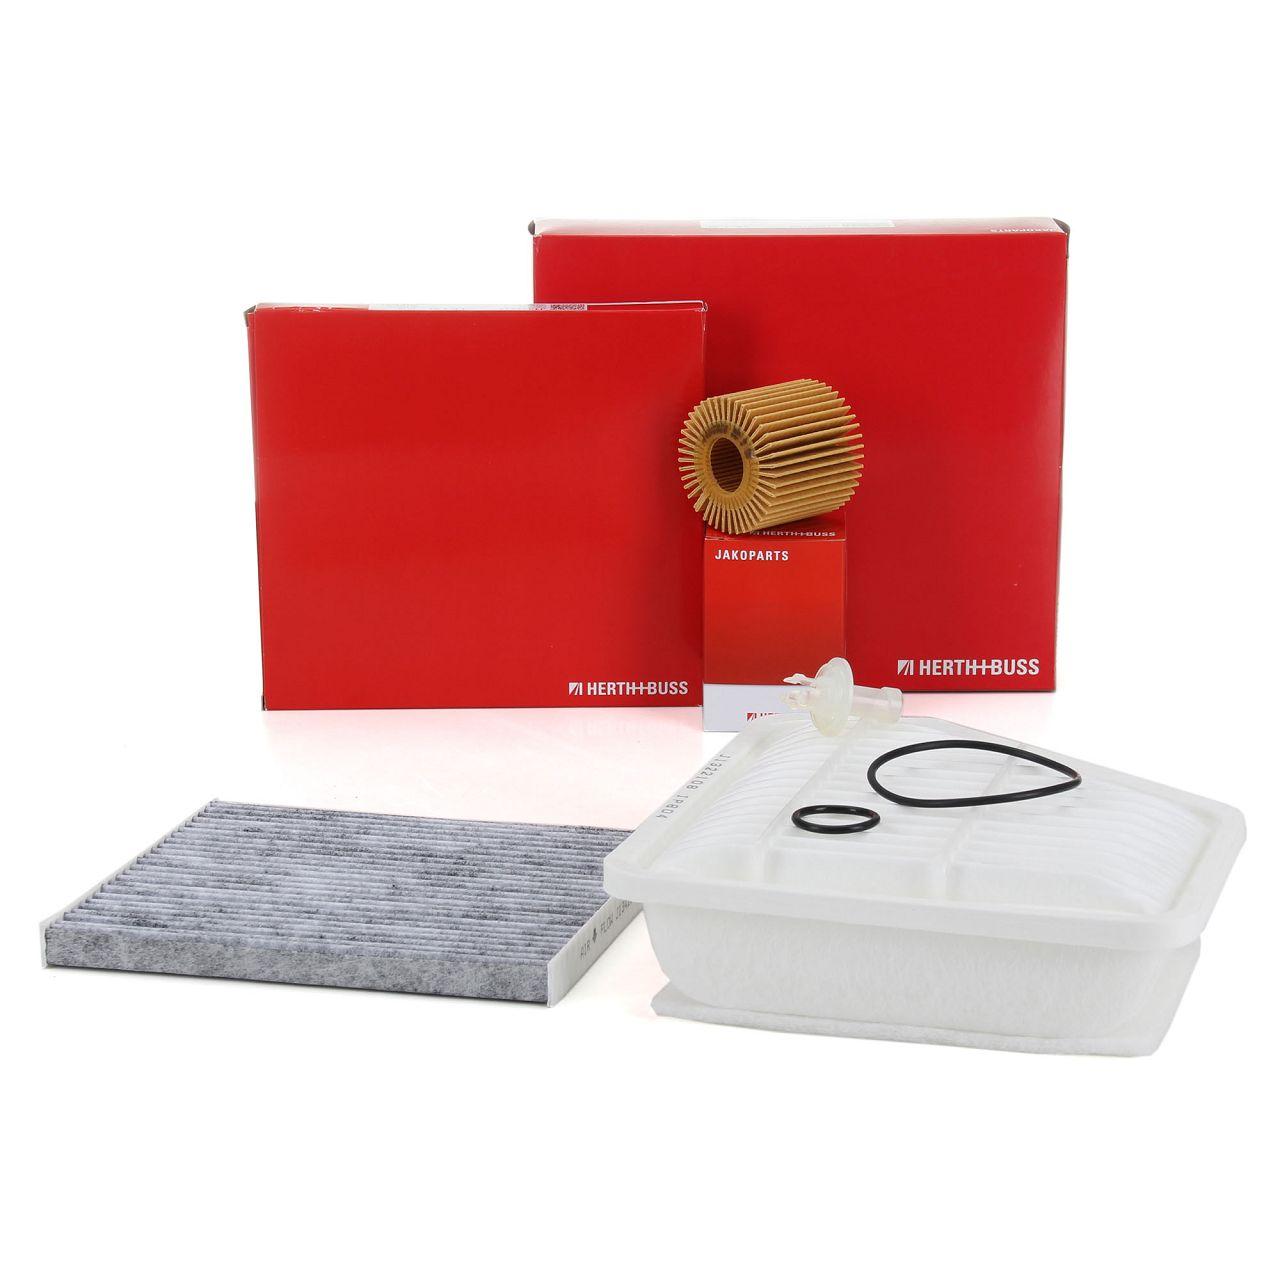 HERTH+BUSS JAKOPARTS Inspektionskit Filterpaket für TOYOTA AURIS 1.4 D-4D 90 PS